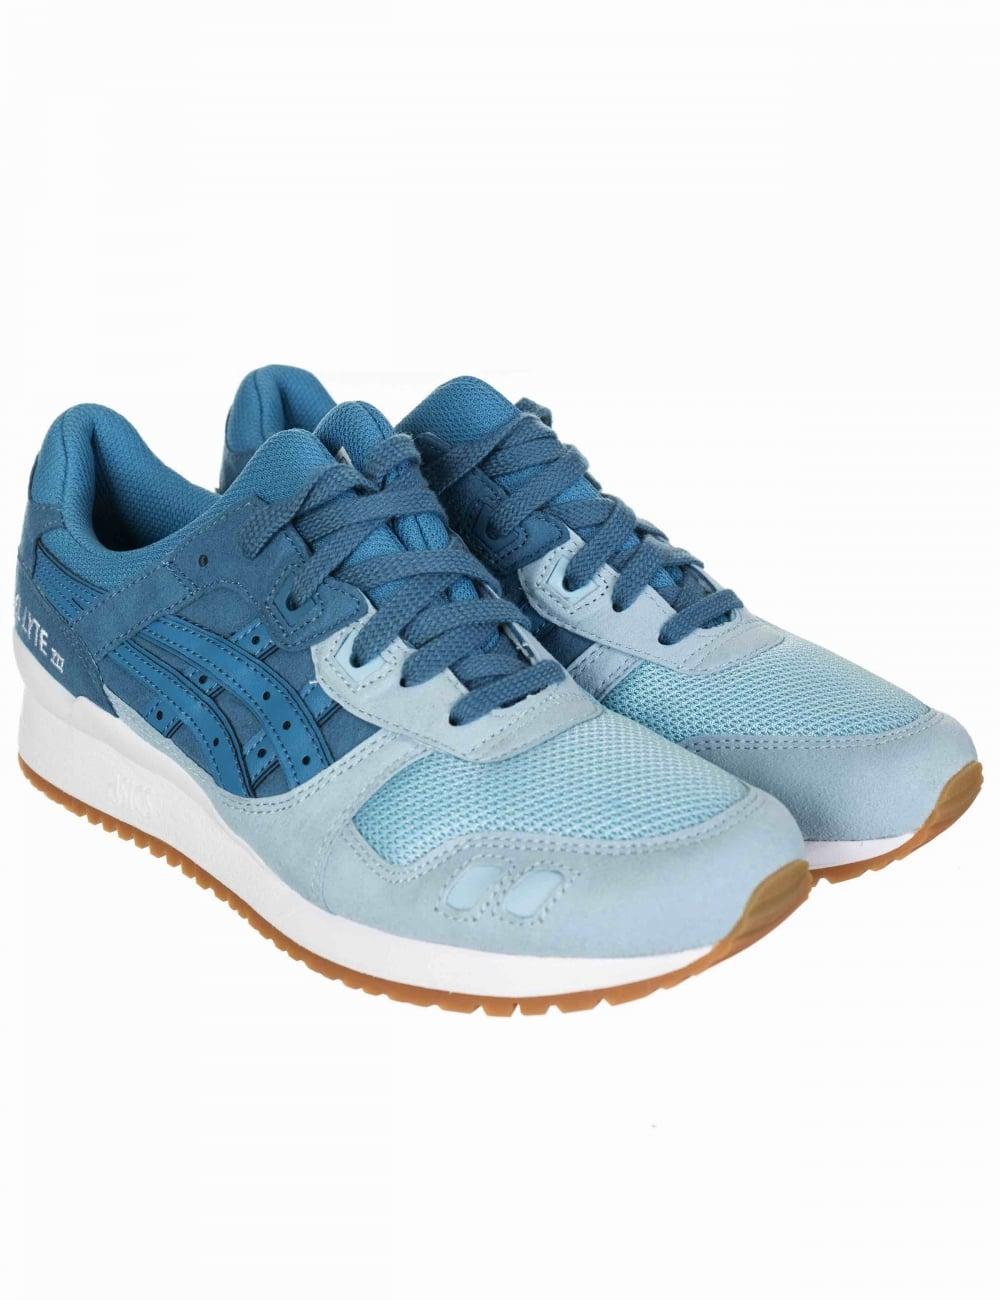 hot sale online a3f68 ae4cd Gel Lyte III Trainers - Blue Heaven/Corydalis Blue